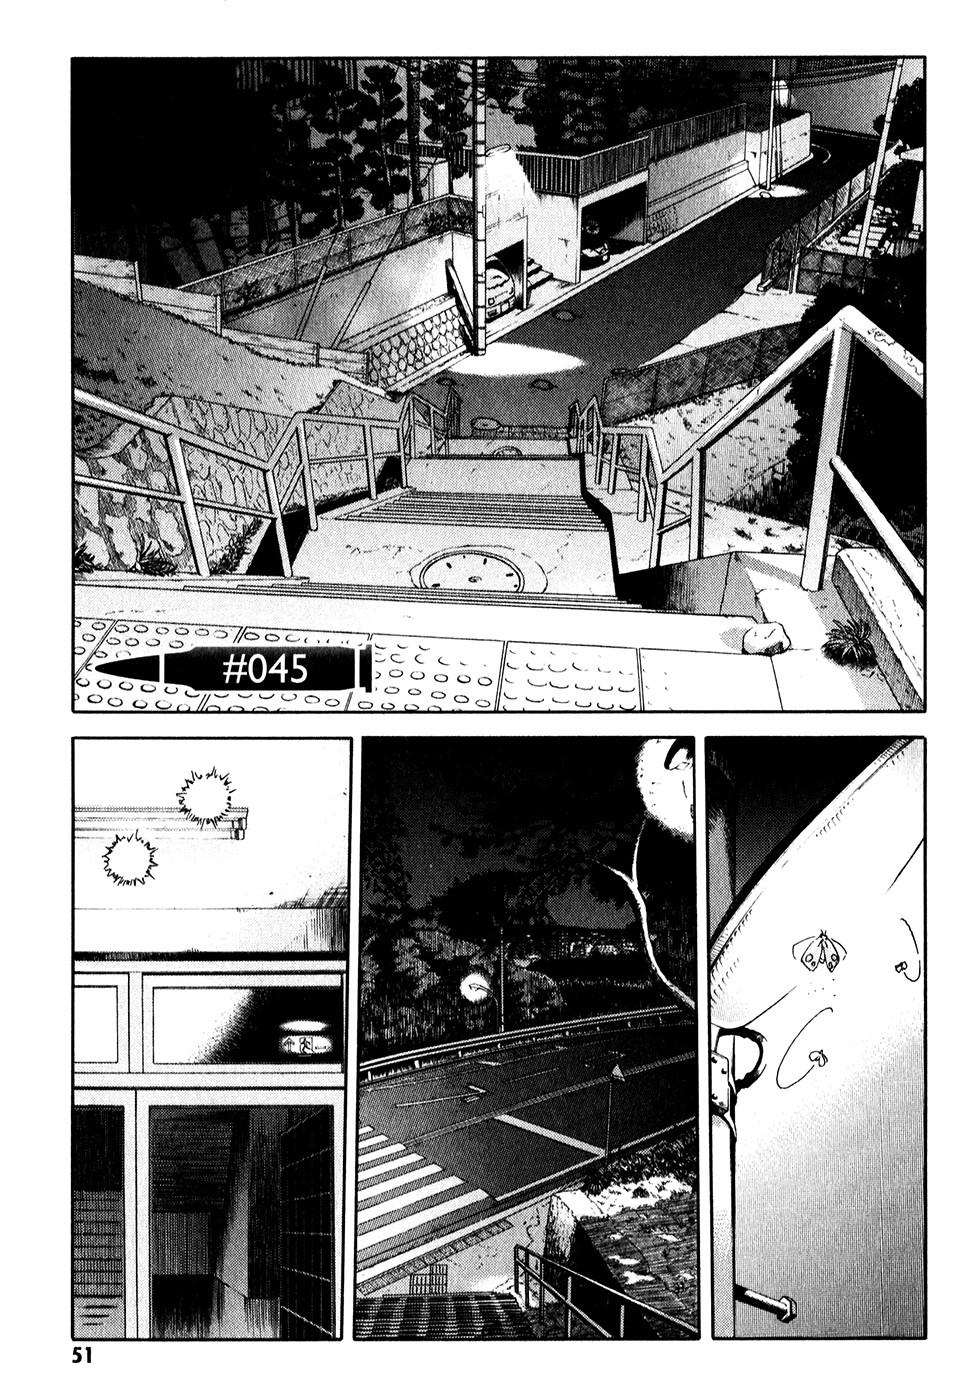 https://r2.ninemanga.com/comics/pic4/34/38242/1365533/156021063996.jpg Page 1